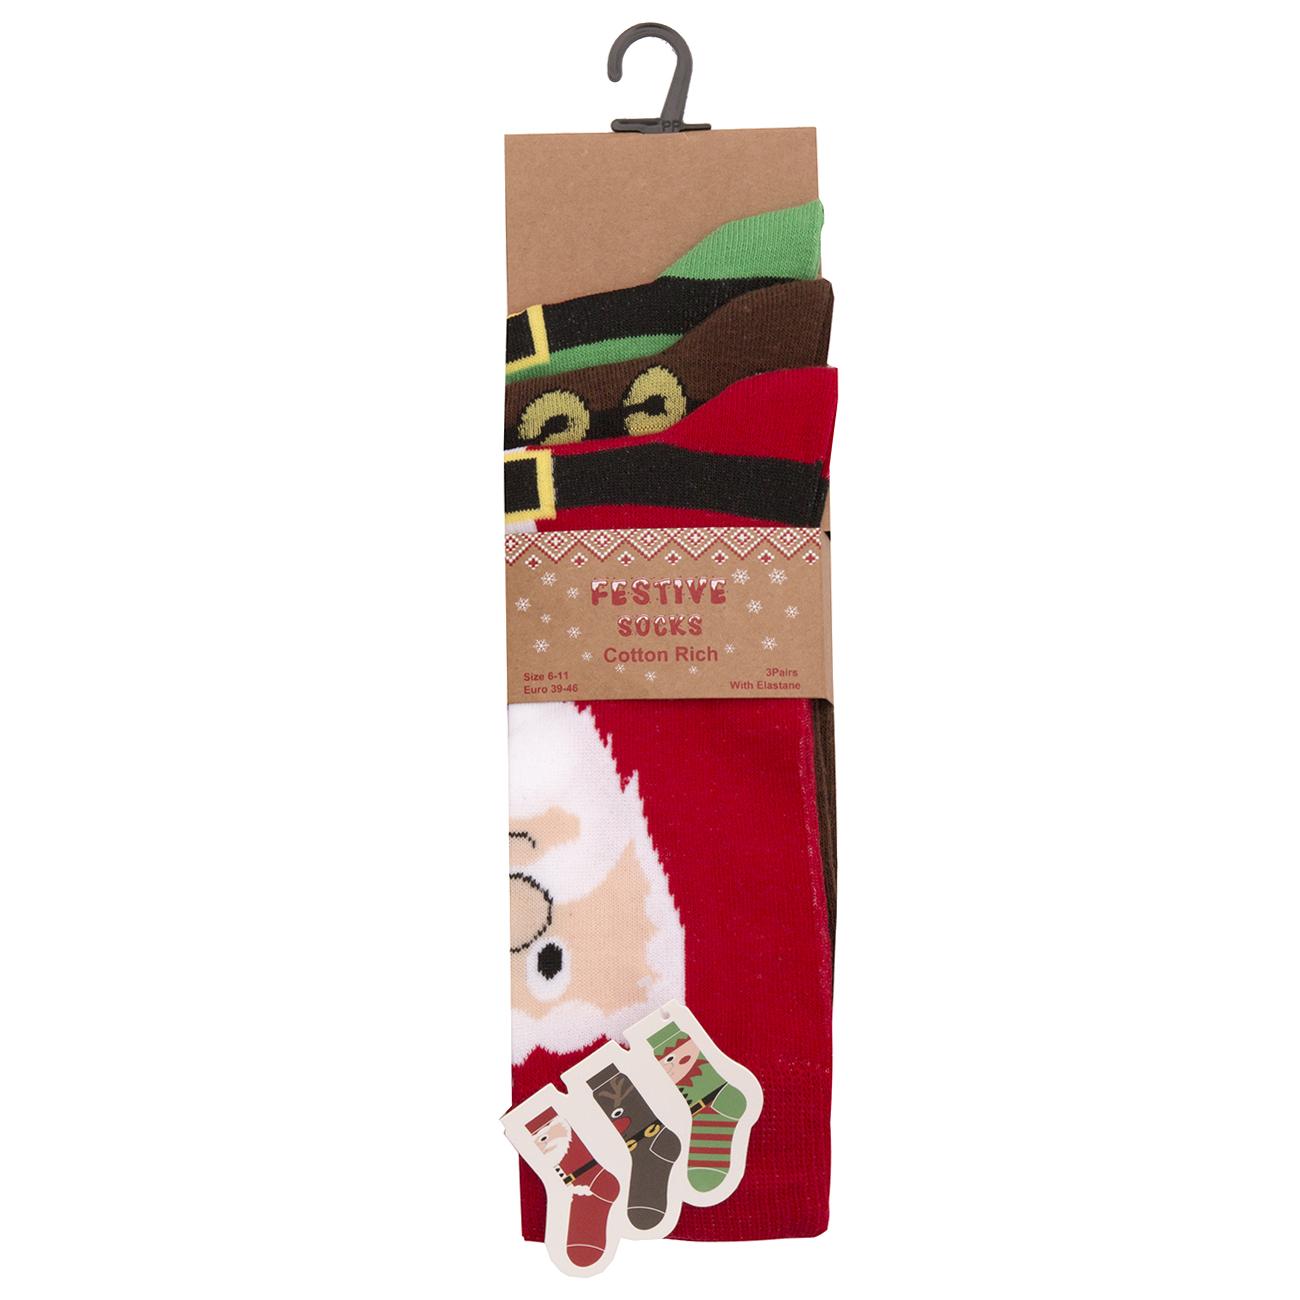 Boys Kids Childrens Christmas Socks 3 or 6 Pairs Xmas Gift Cotton Rich Festive